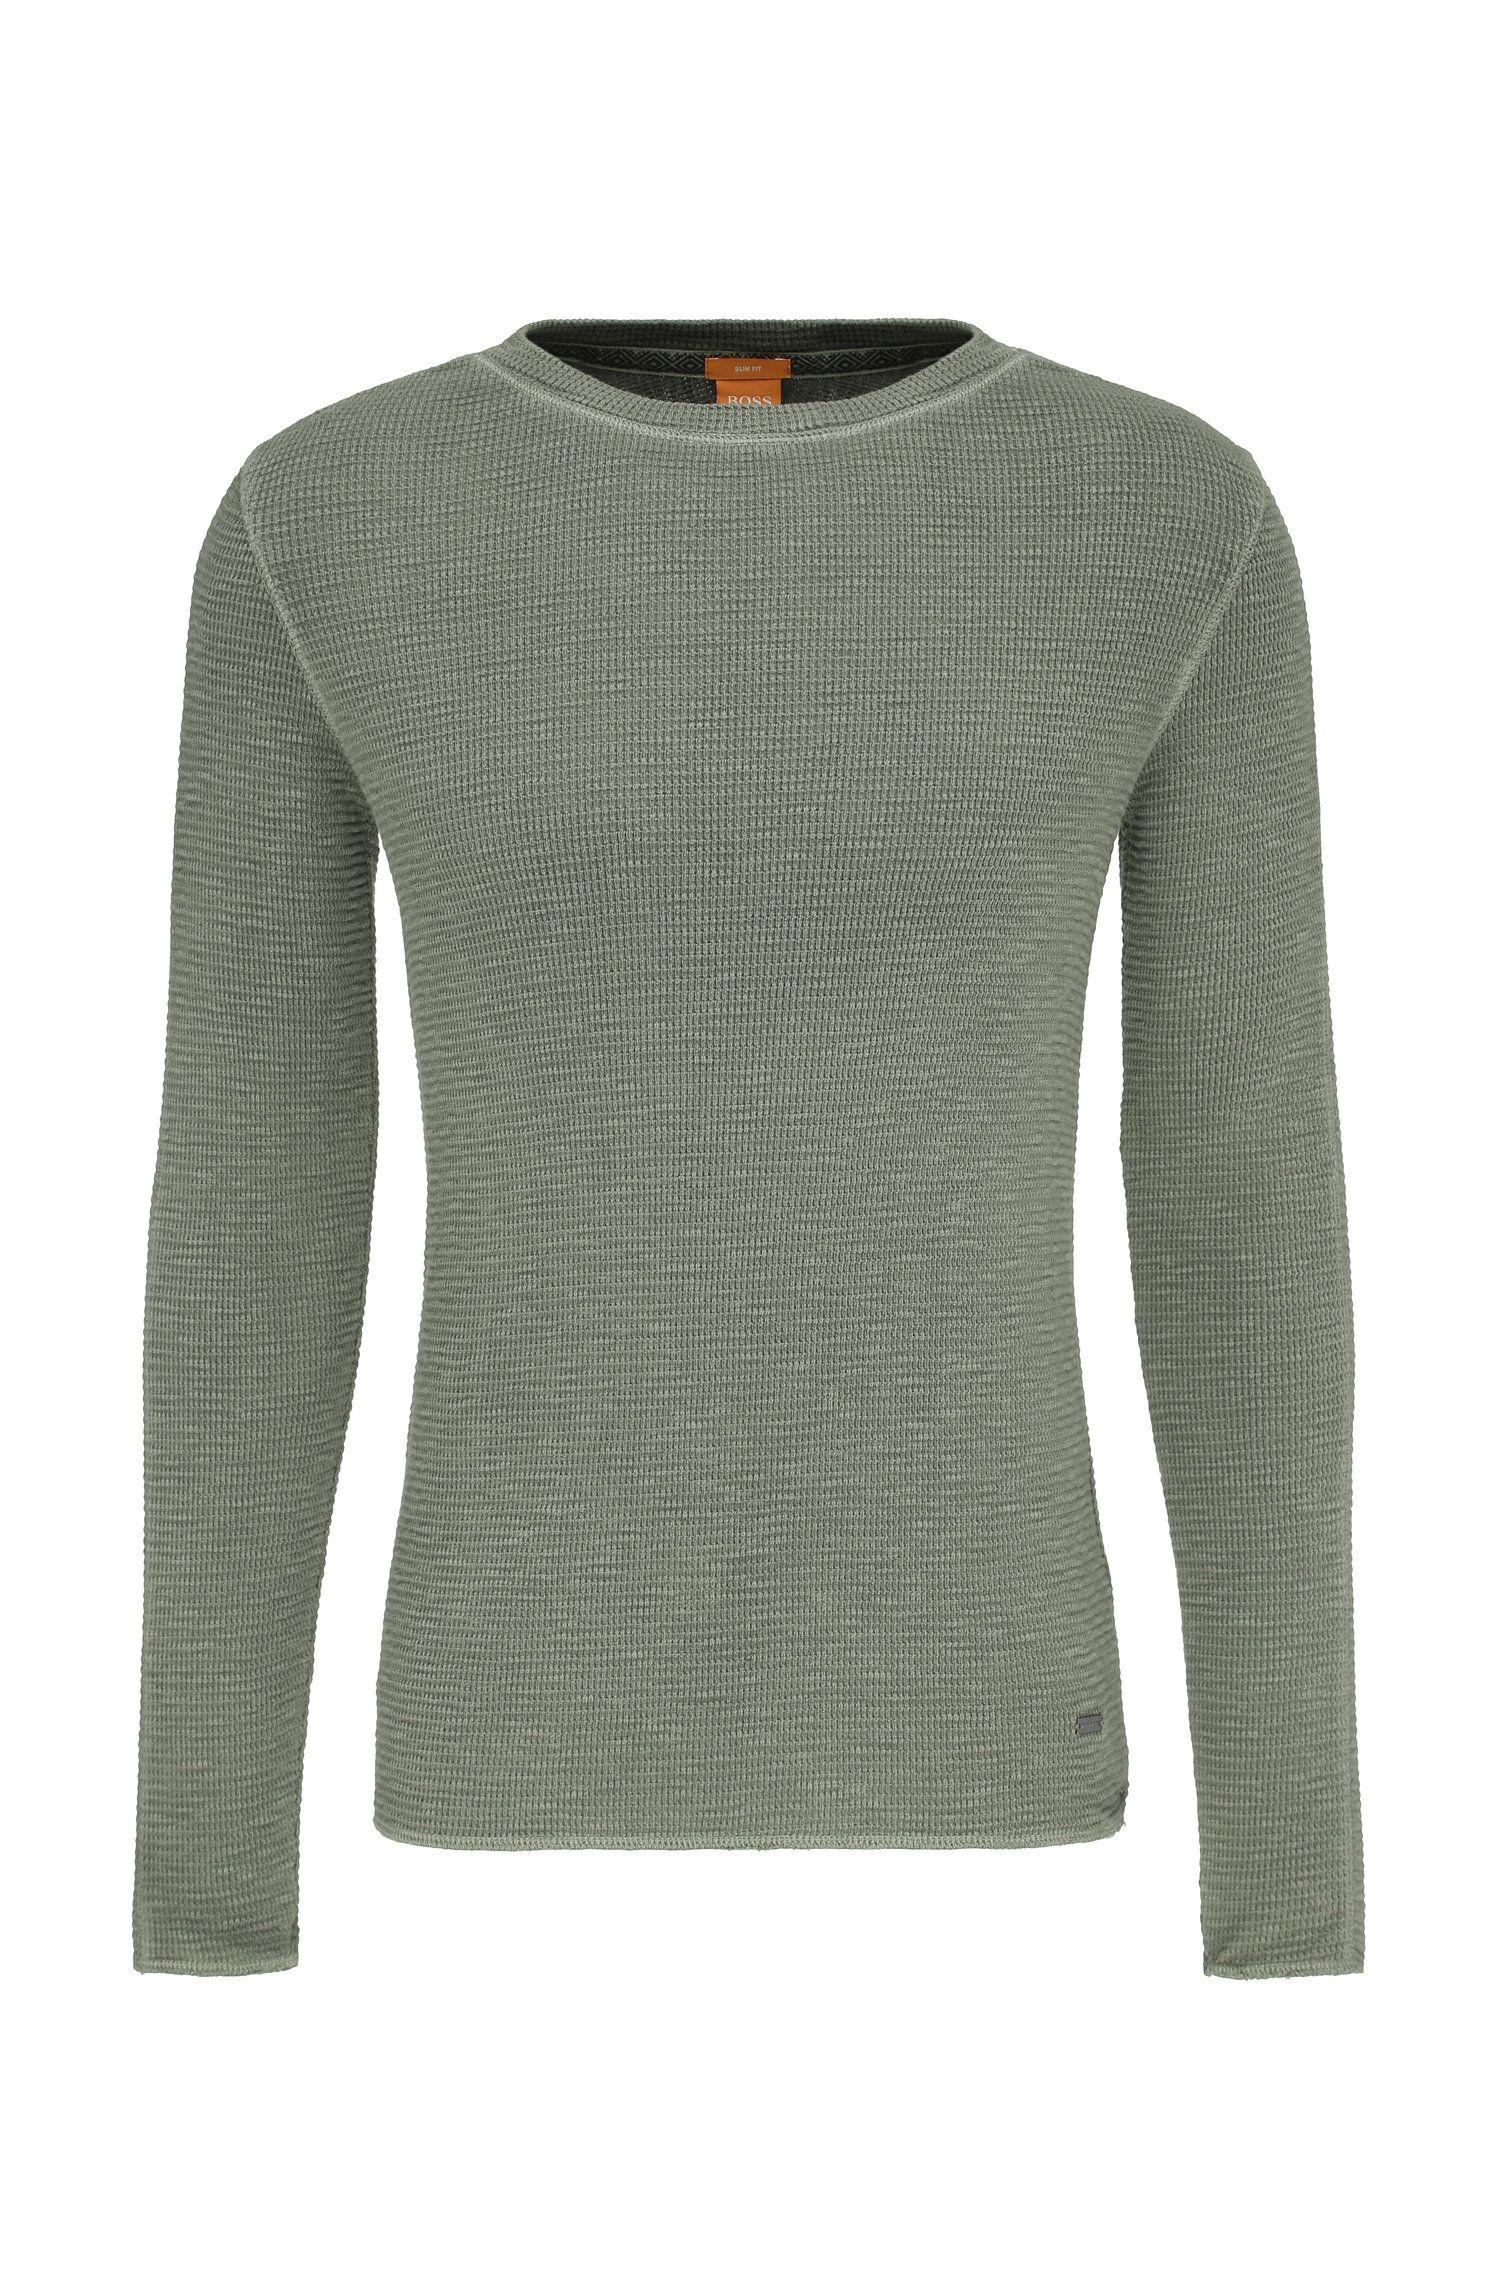 Gestructureerde slim-fit trui van katoen: 'Werk'